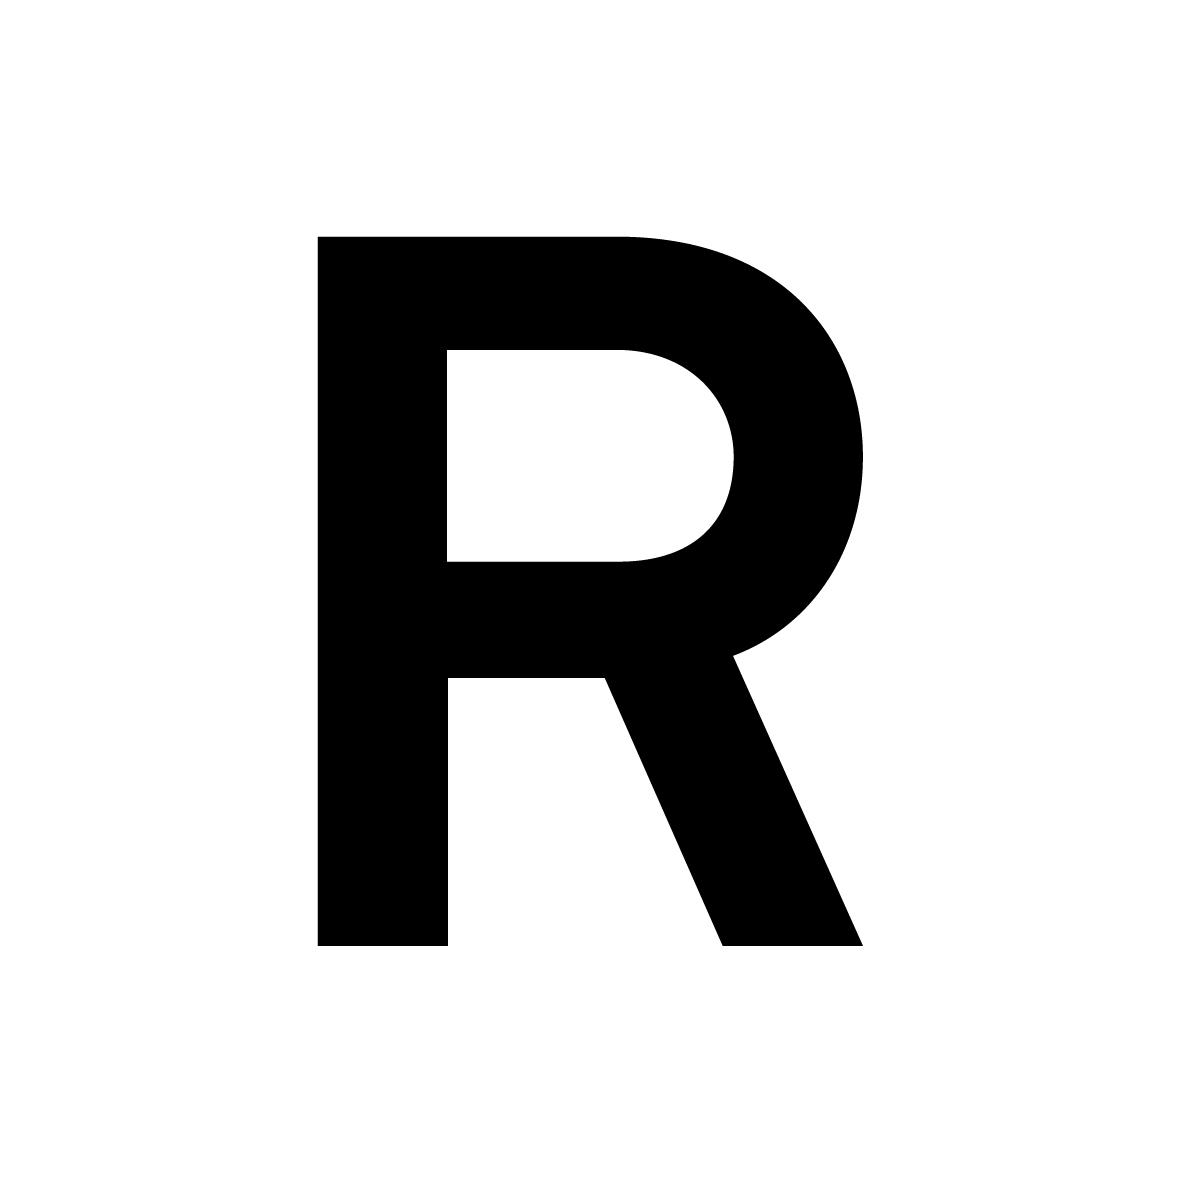 RAUMTAKT GmbH